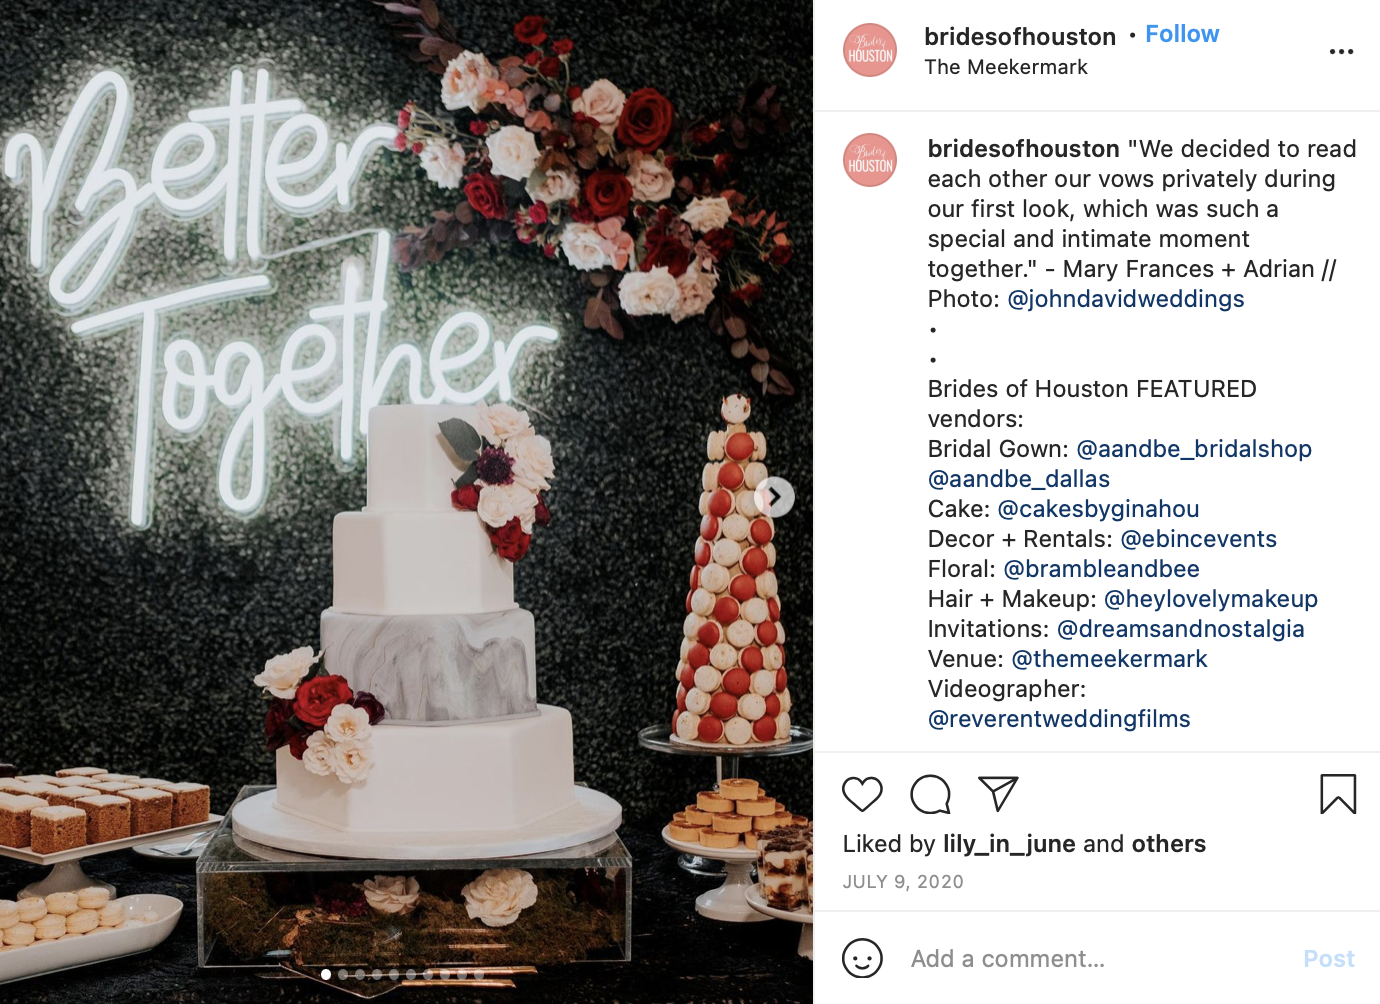 burgundy, white, and dark brown wedding cake table